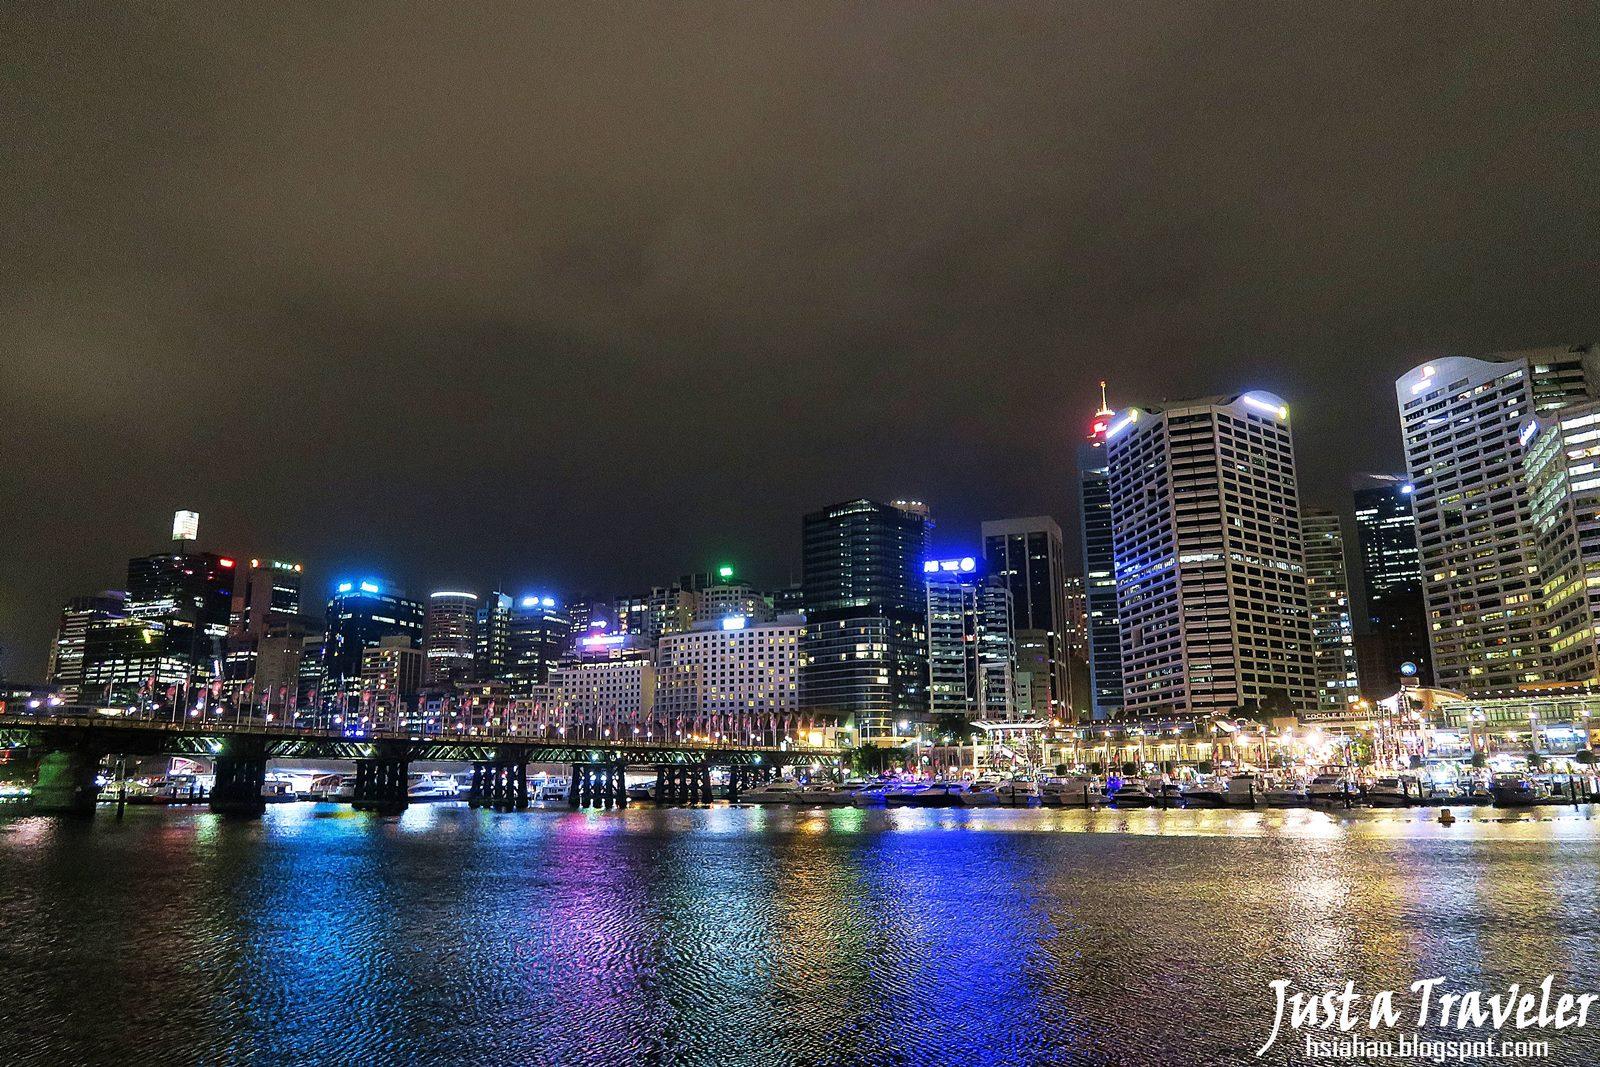 雪梨-景點-推薦-達令港-夜景-自由行-行程-旅遊-澳洲-Sydney-Darling-Harbour-Tourist-Attraction-Travel